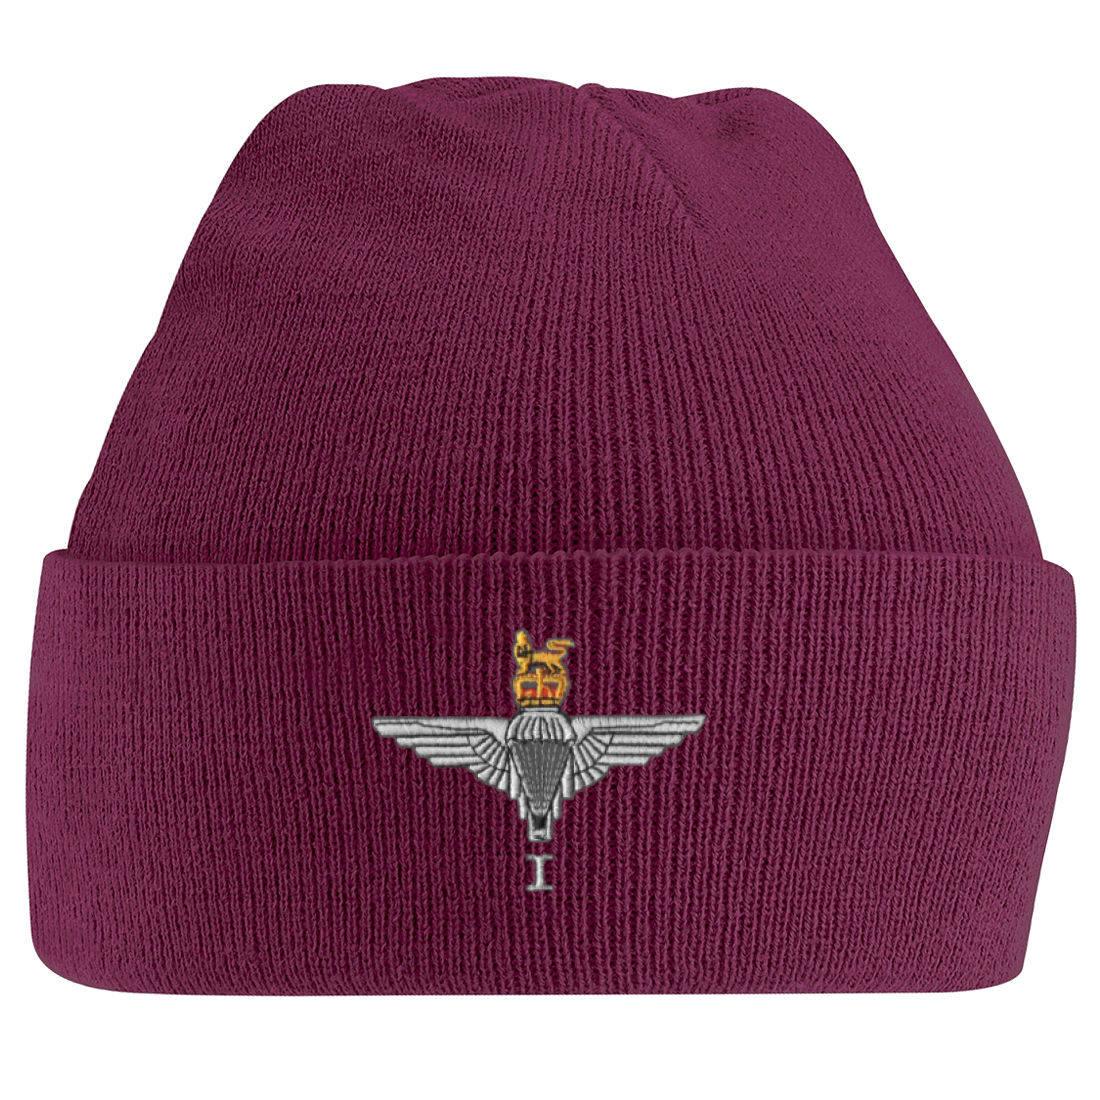 Turn-Up Beanie Hat